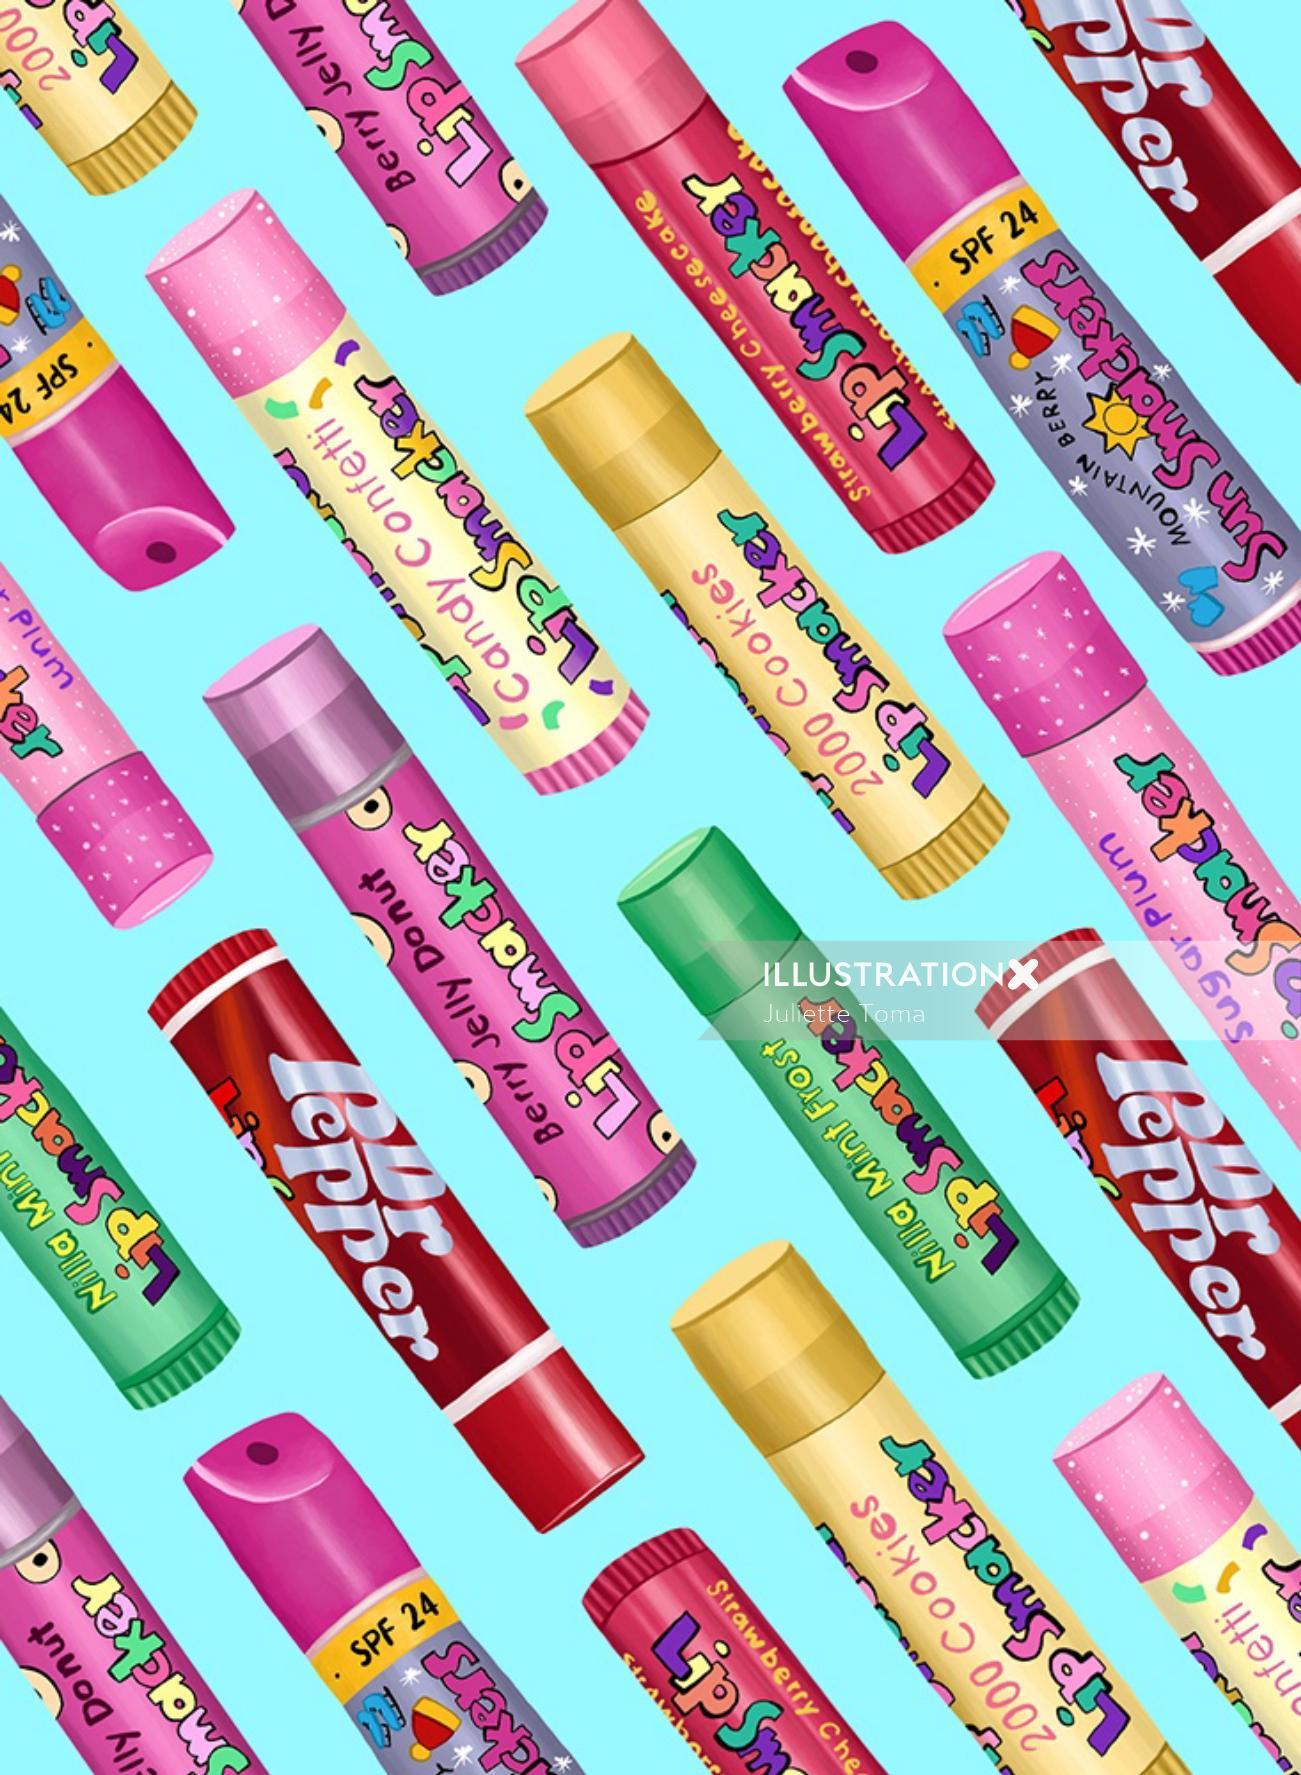 Packaging illustration of Lip Smacker